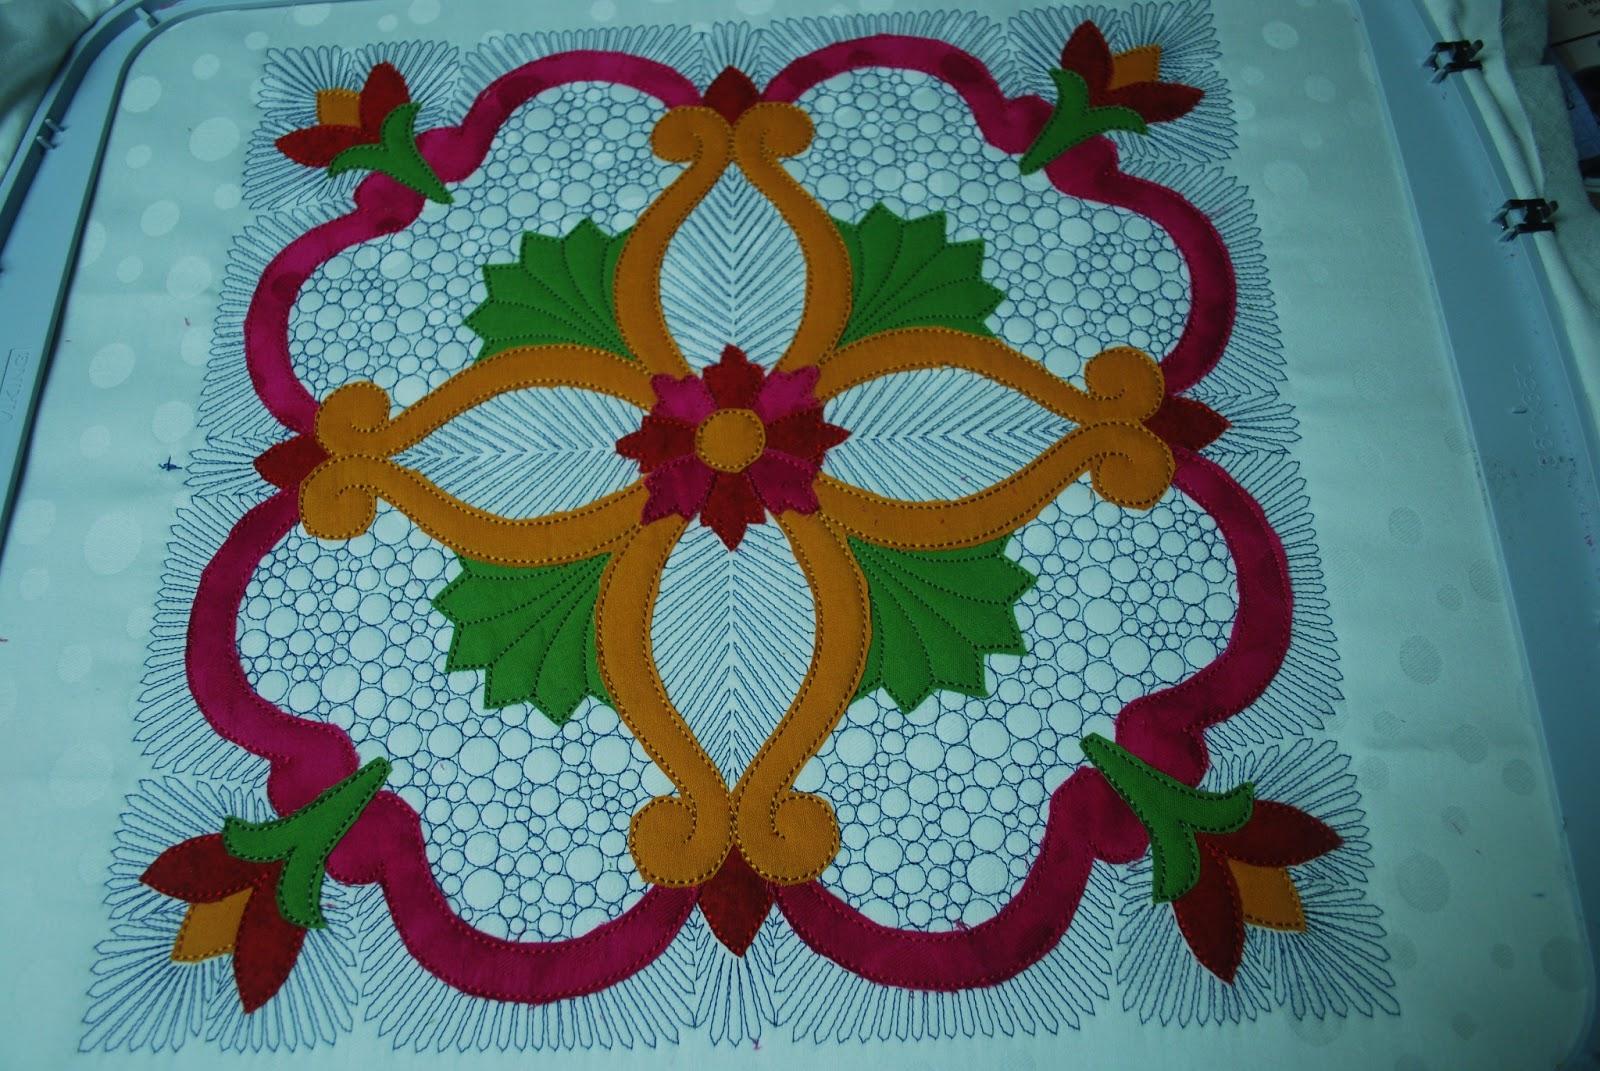 Seecherylsew Husqvarna Viking Embroidery Applique Design